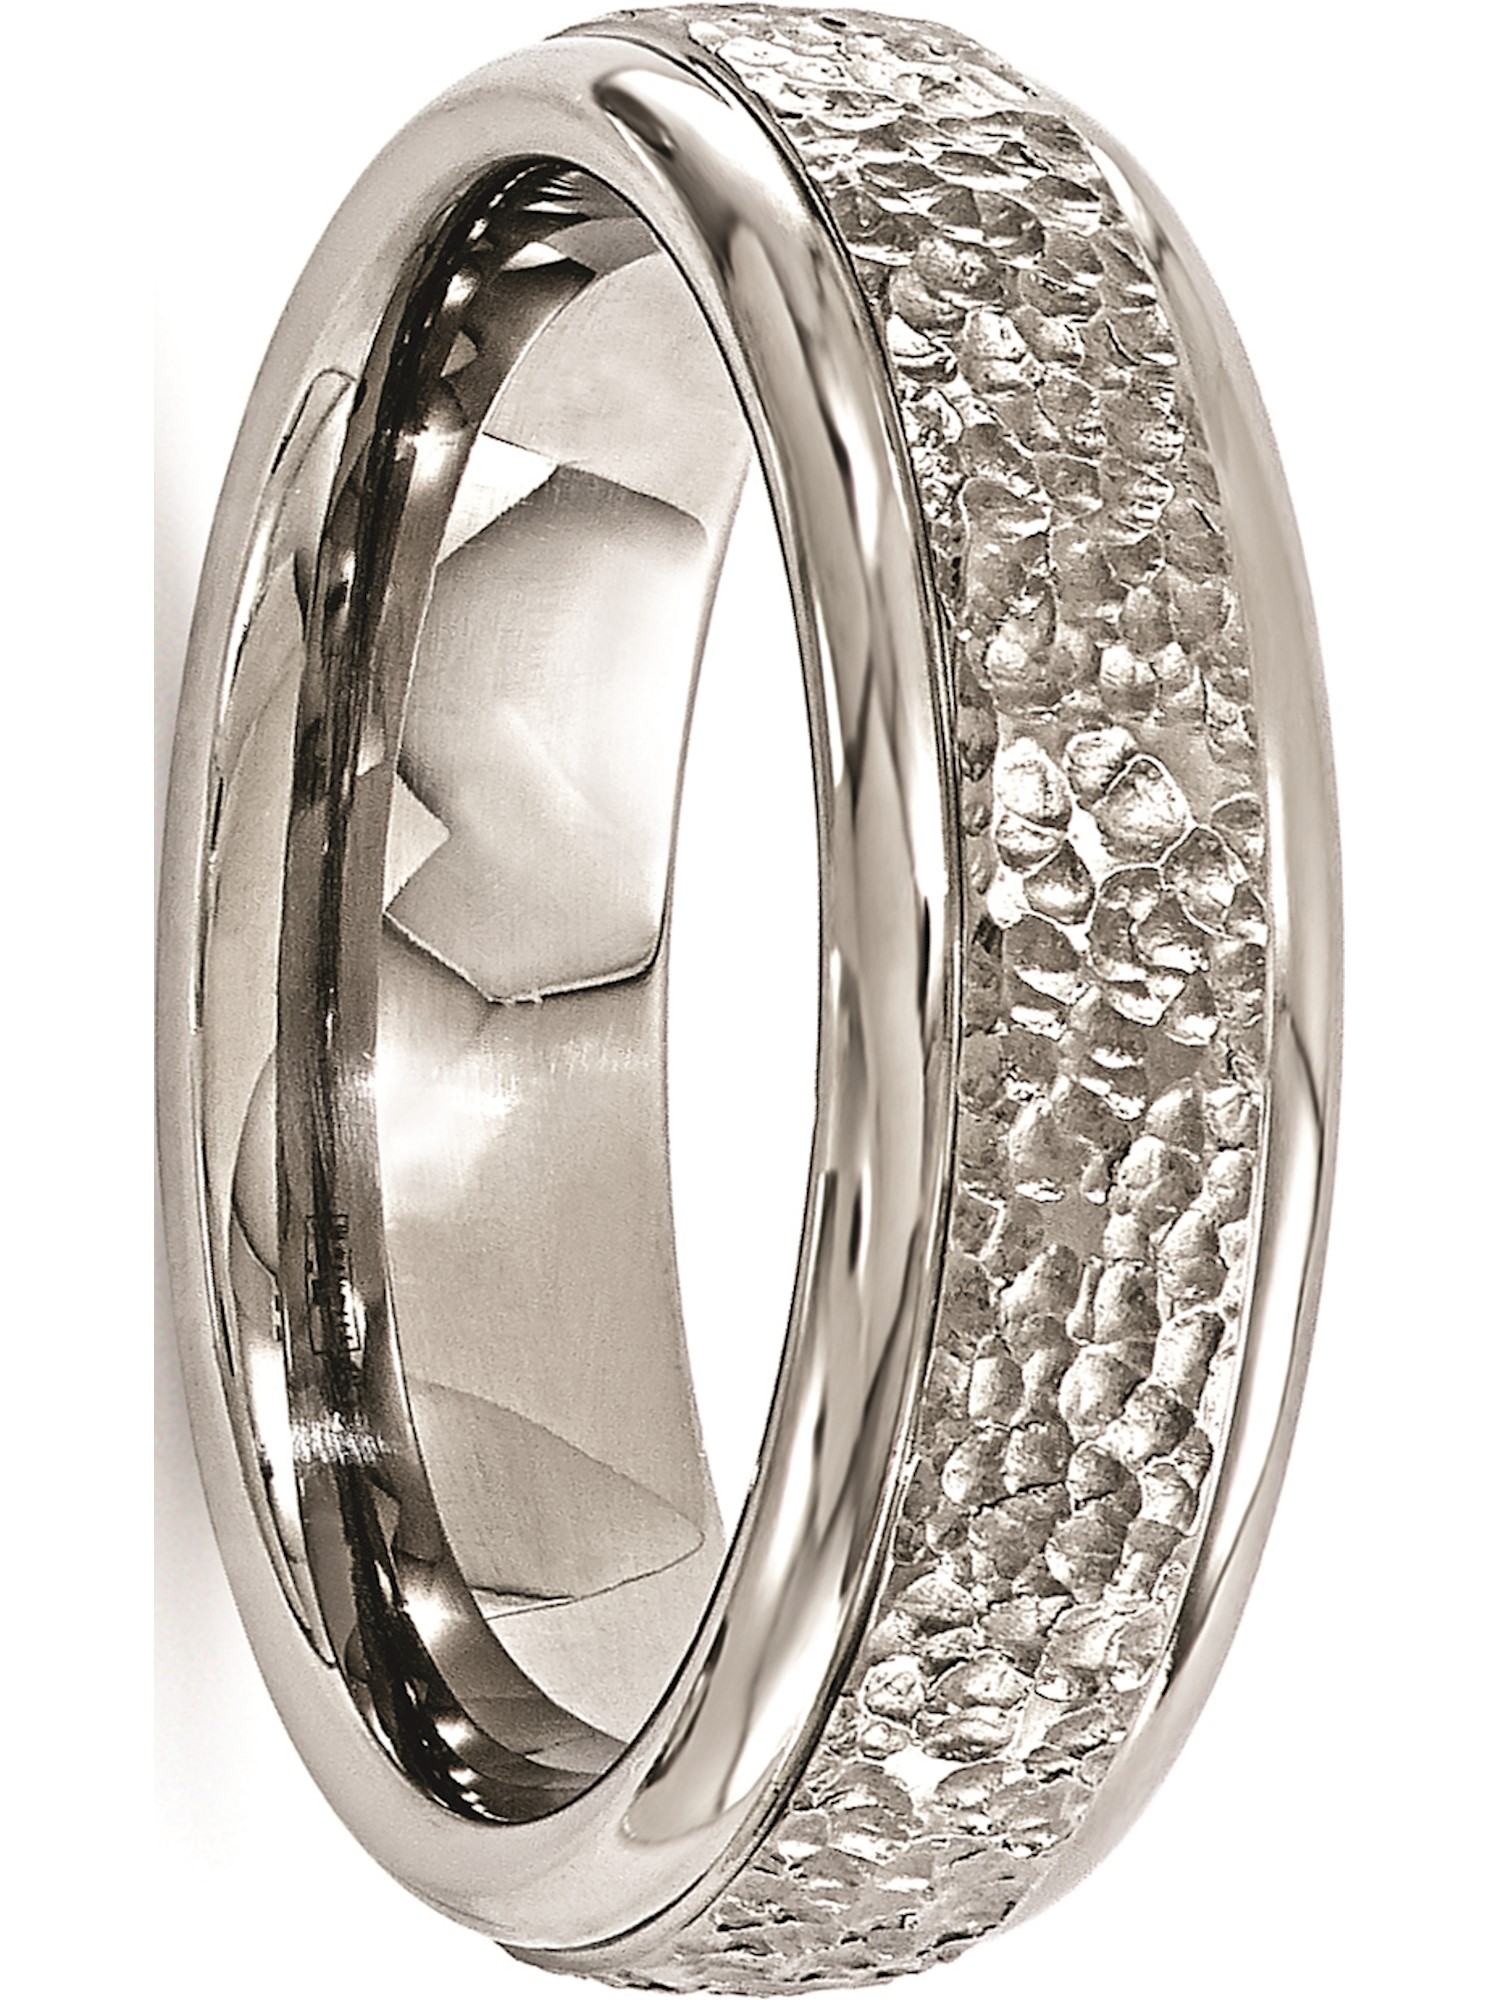 Bridal Wedding Bands Decorative Bands Edward Mirell Titanium Black Ti Domed with Cut Edges 7mm Band Size 11.5